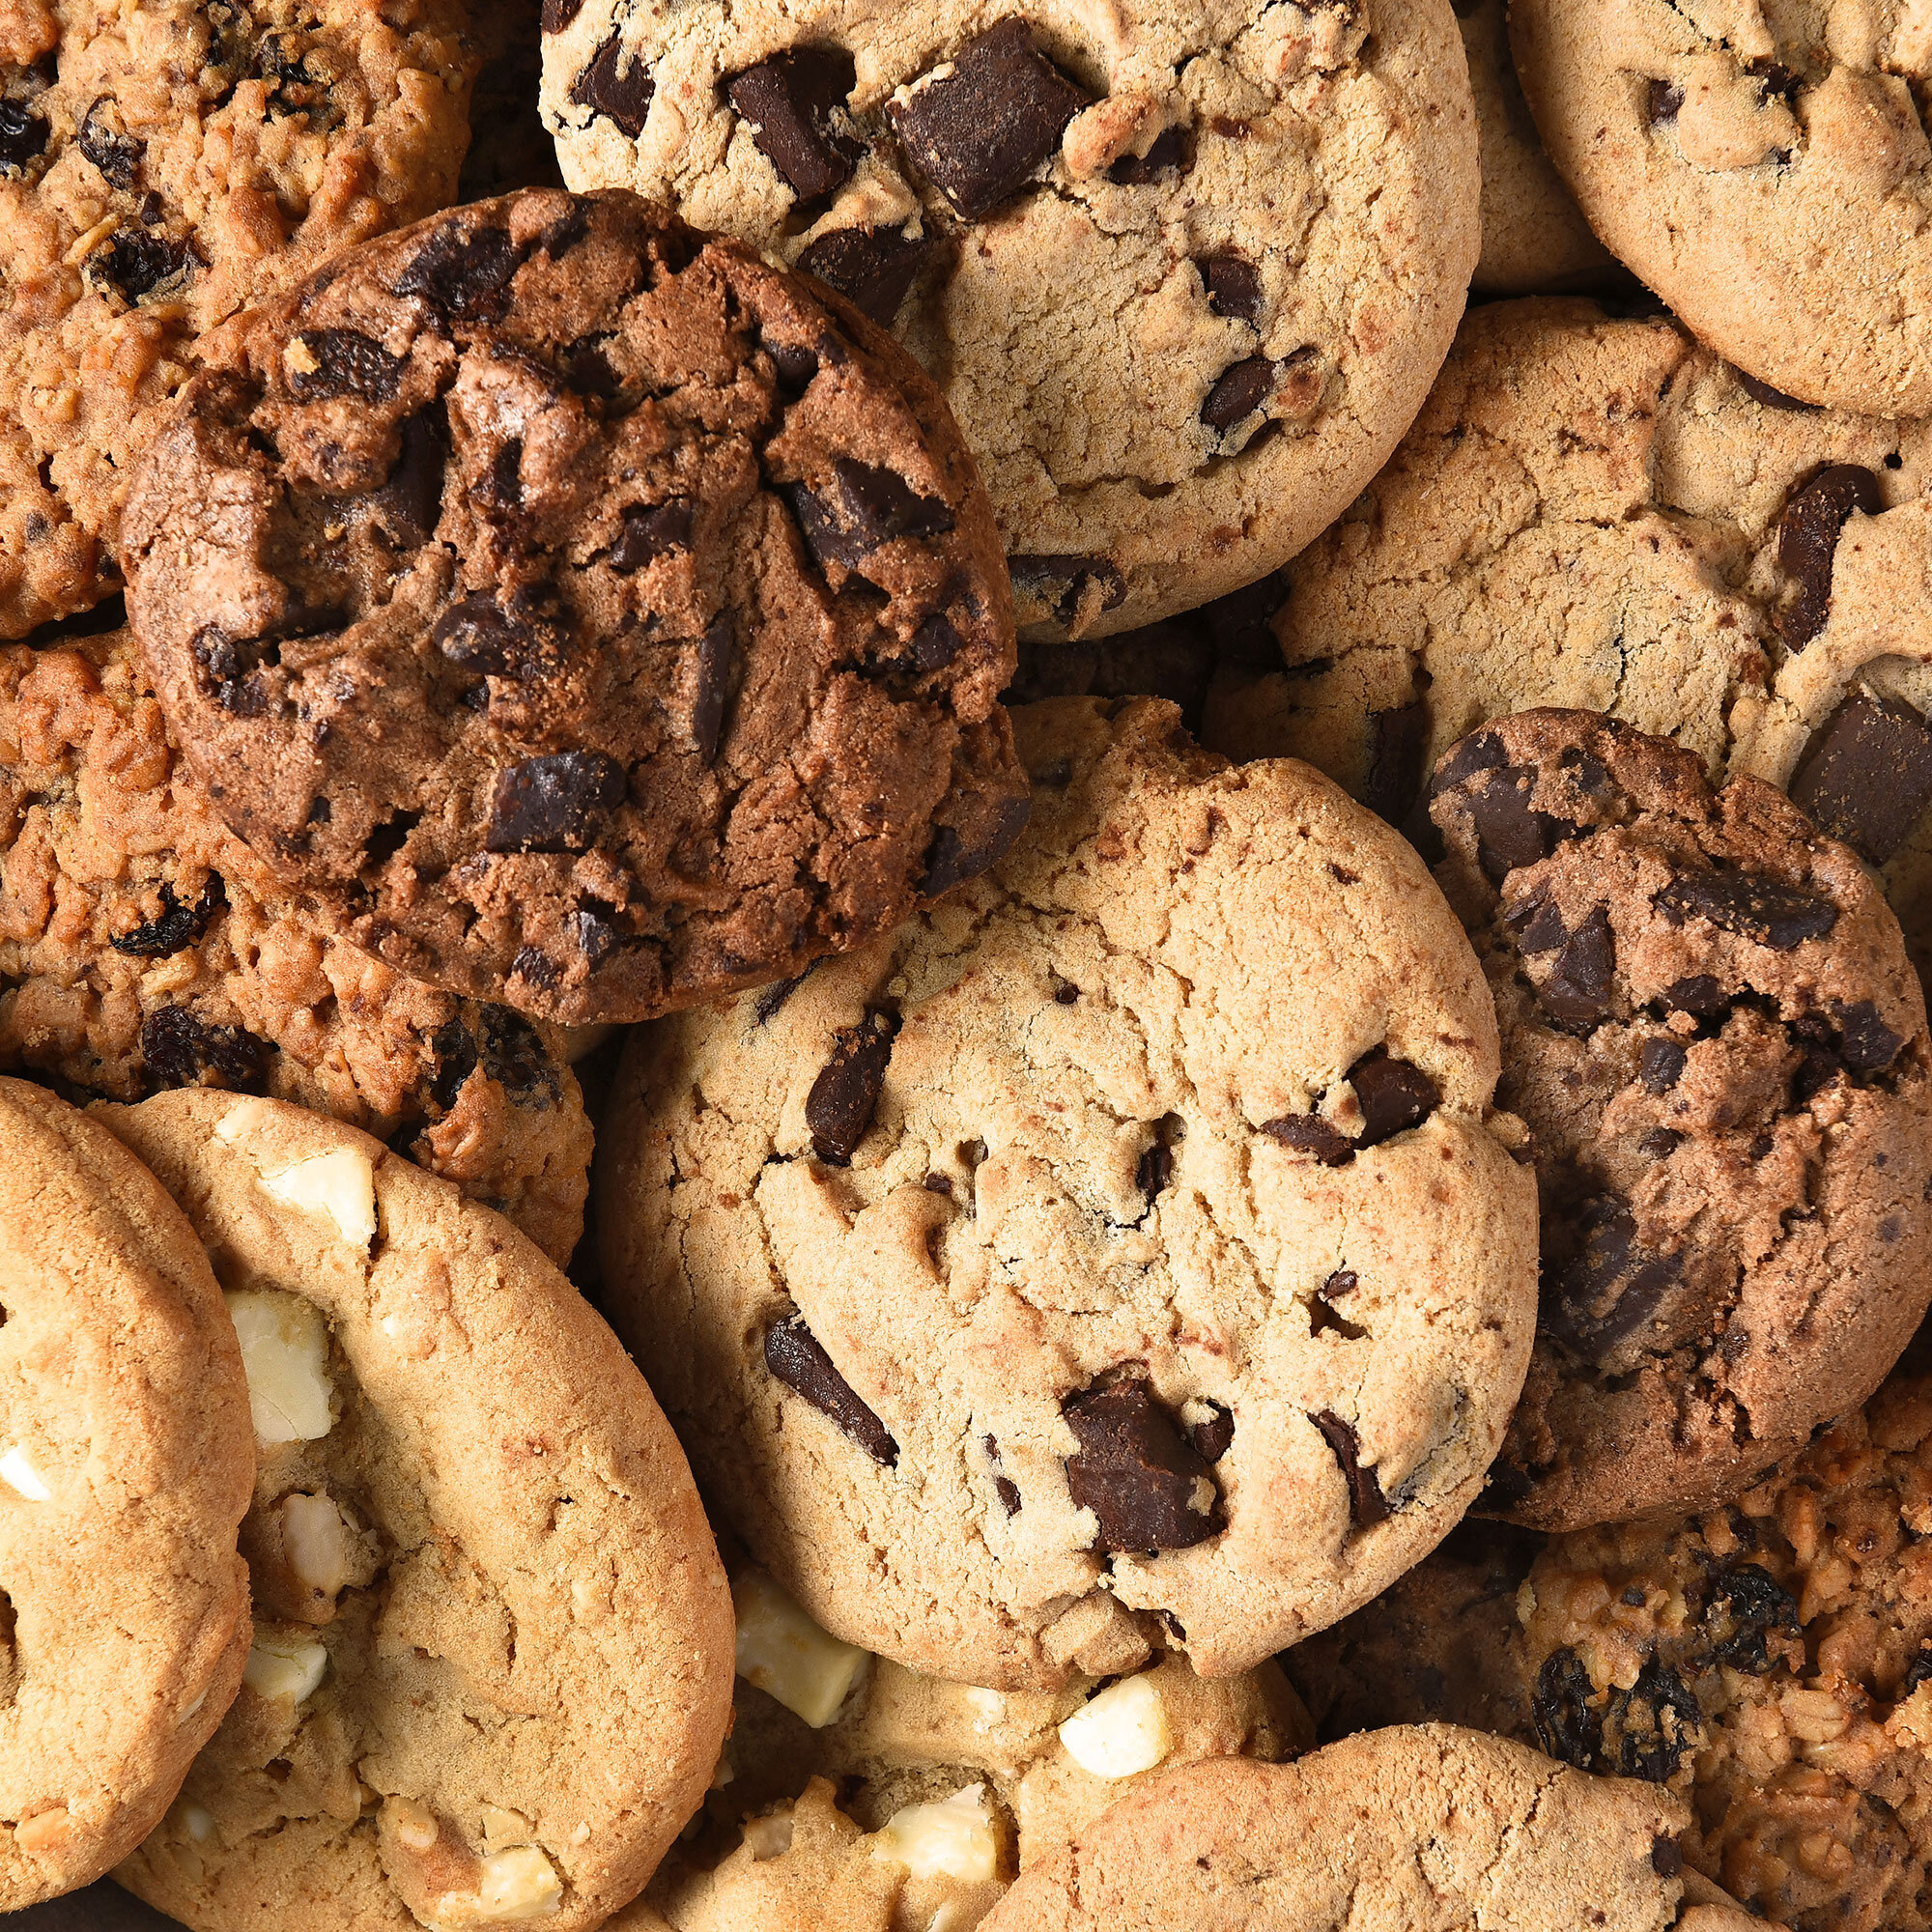 https://www.shirtstore.dk/pub_docs/files/Cookies/CookiesShirtstore.jpg